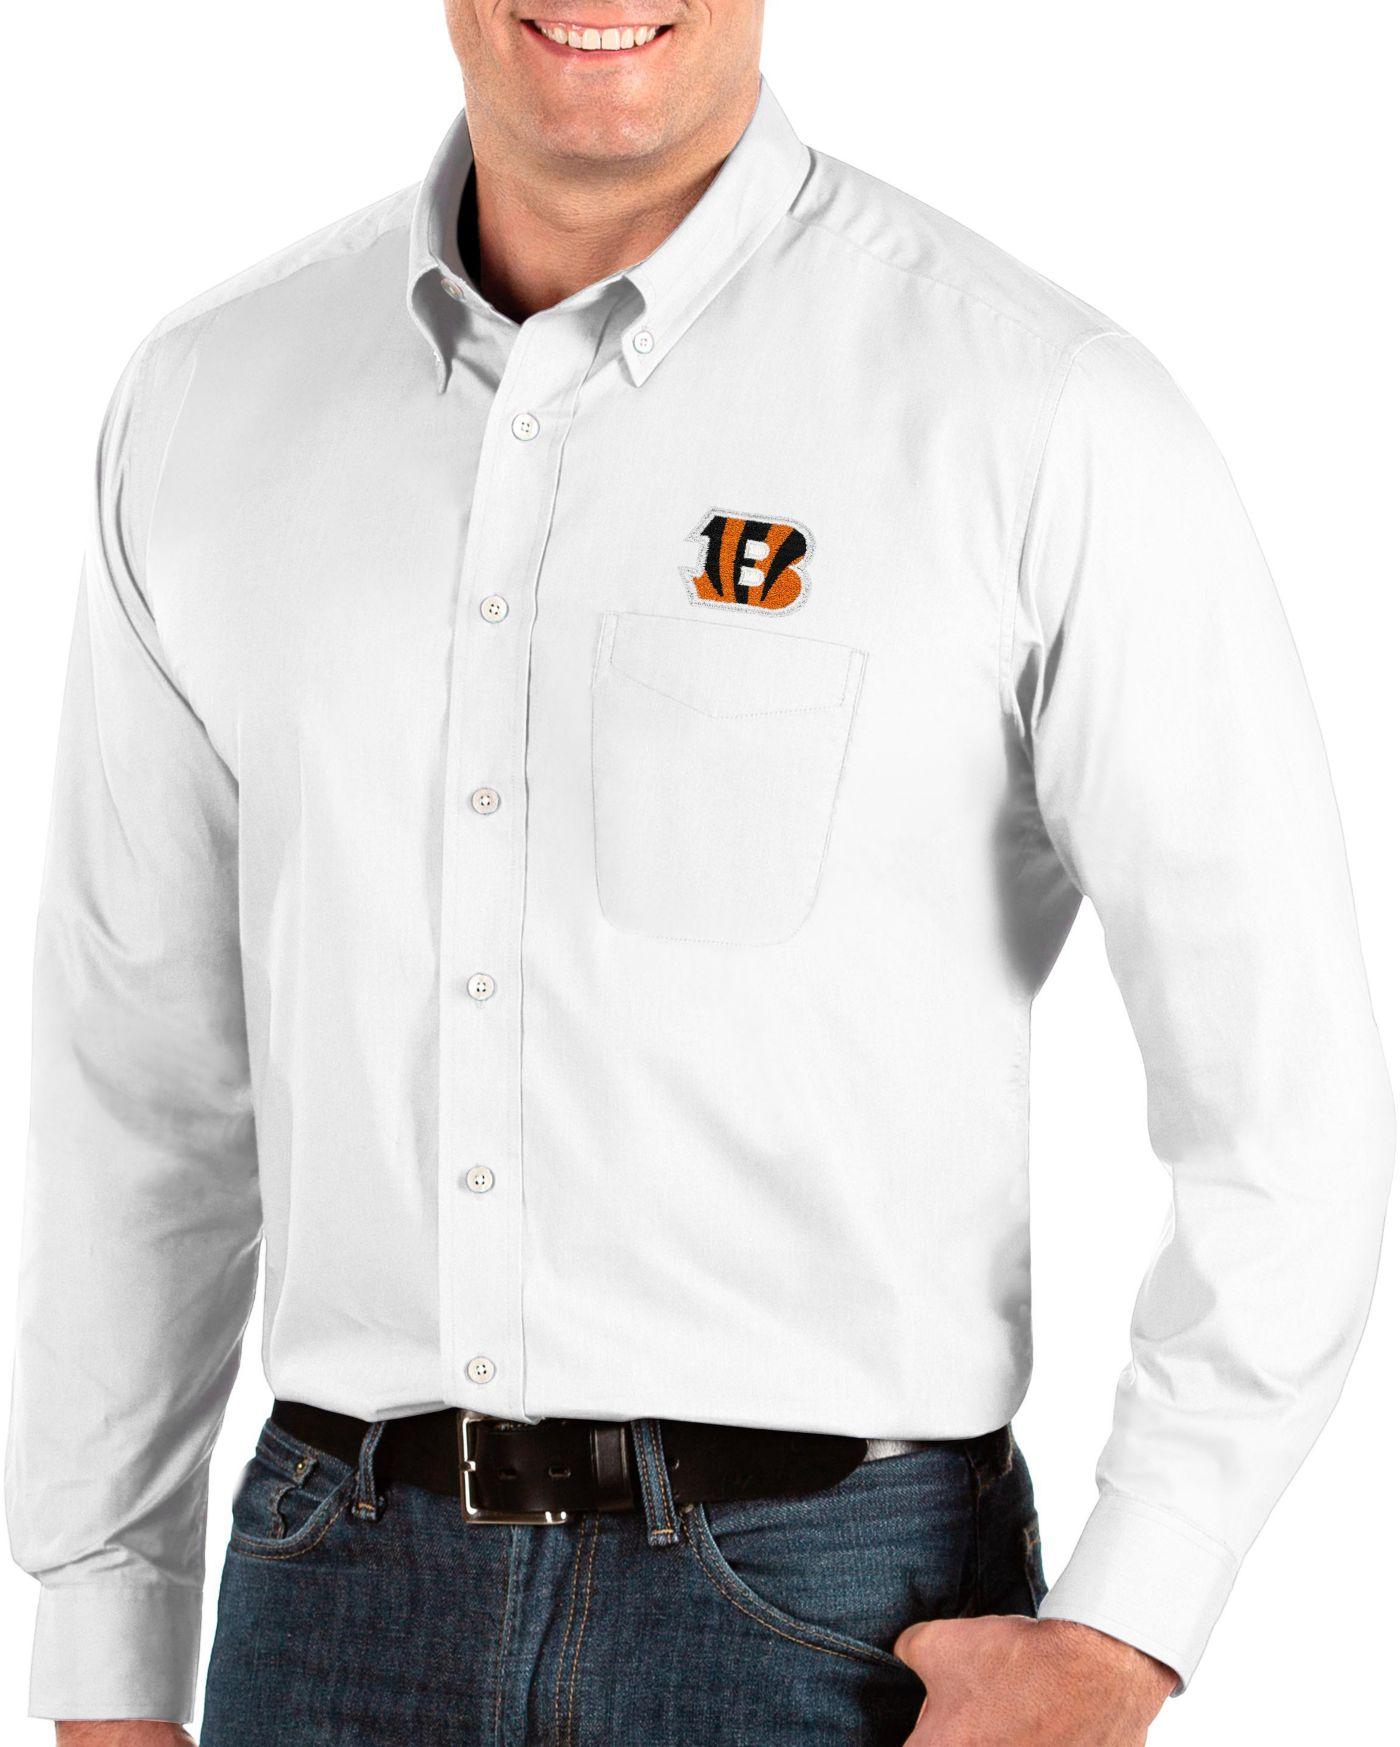 Antigua Men's Cincinnati Bengals Dynasty Button Down White Dress Shirt